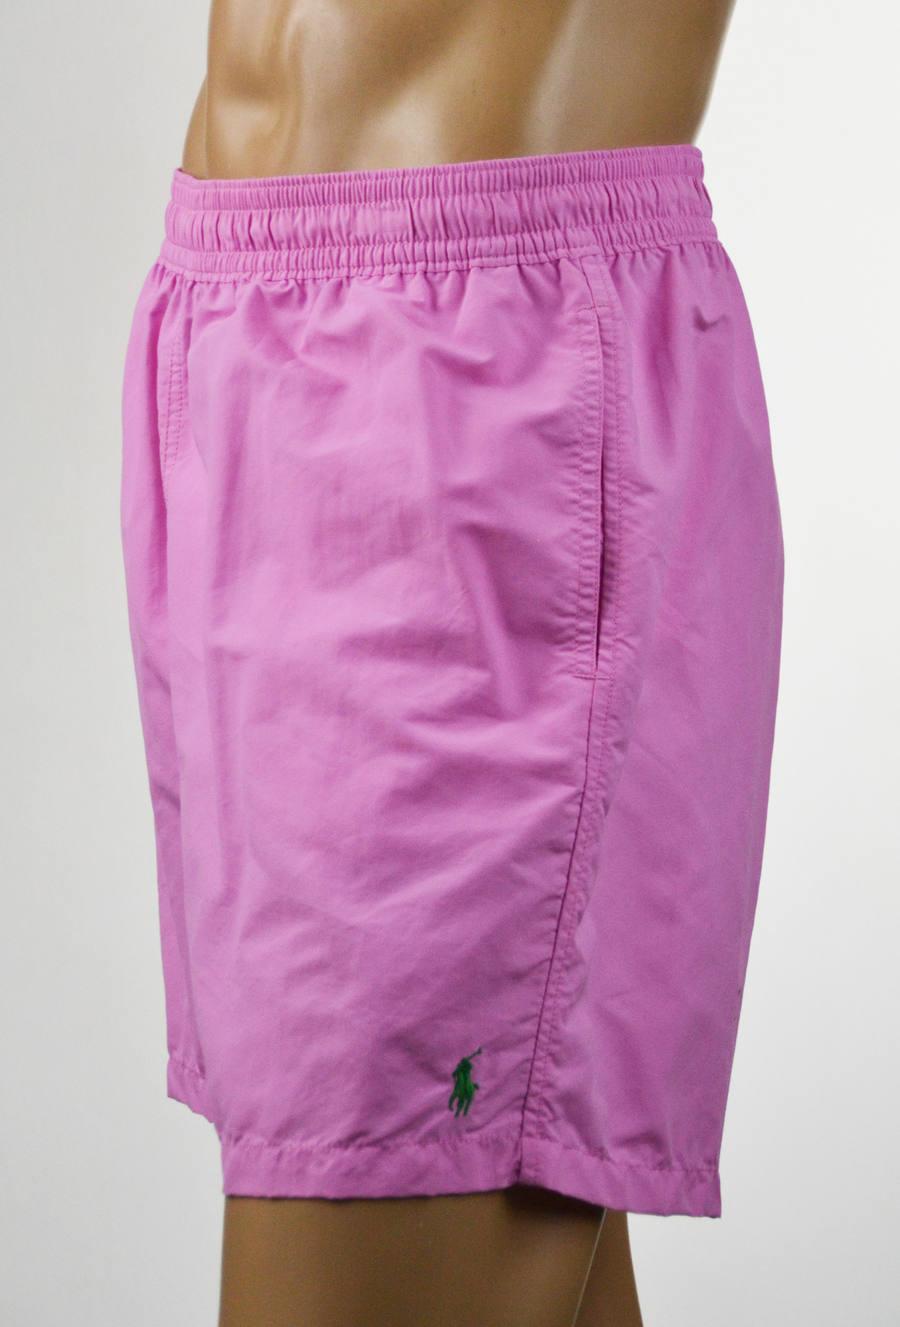 Ralph Lauren Men Pink Swim Short Trunks-XXLarge- NWT